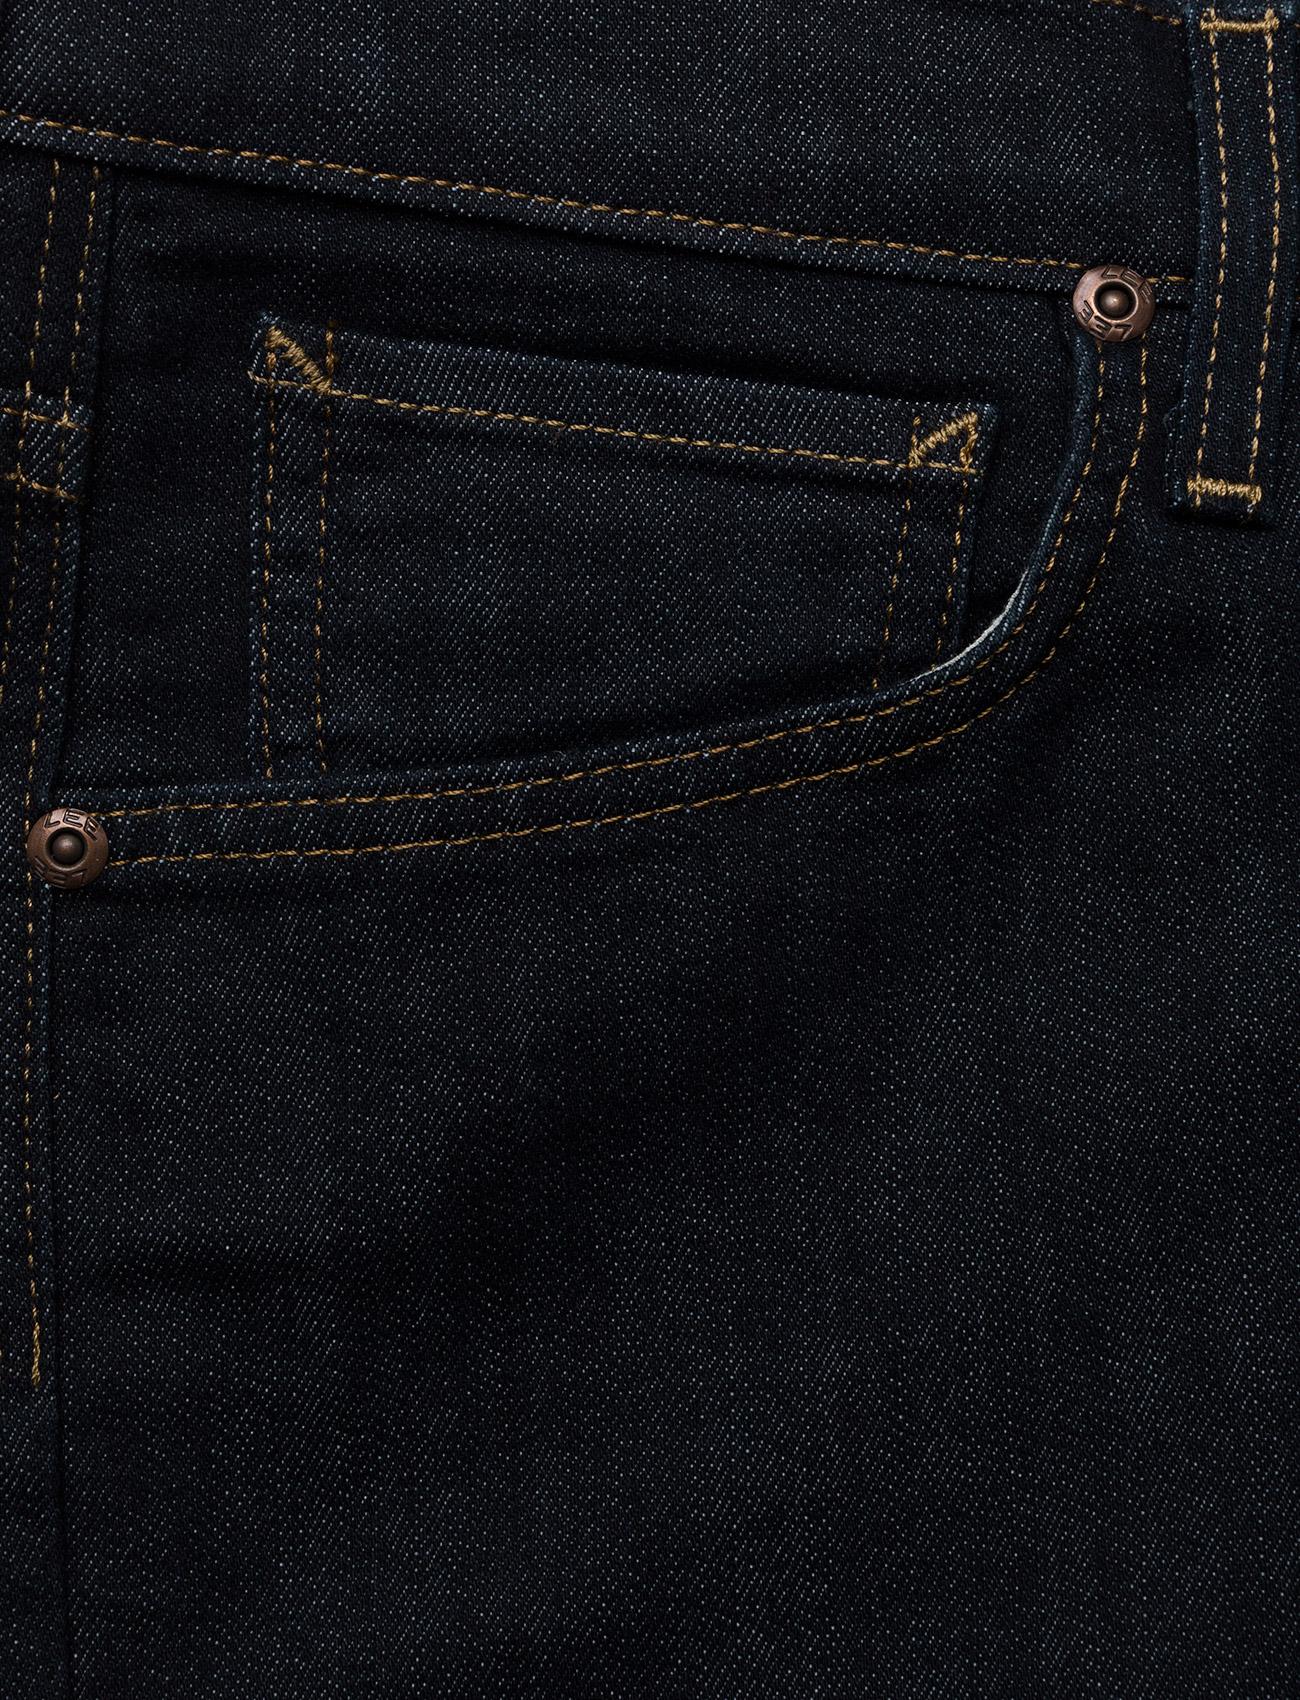 Lee Jeans Rider - Jeans RINSE - Menn Klær